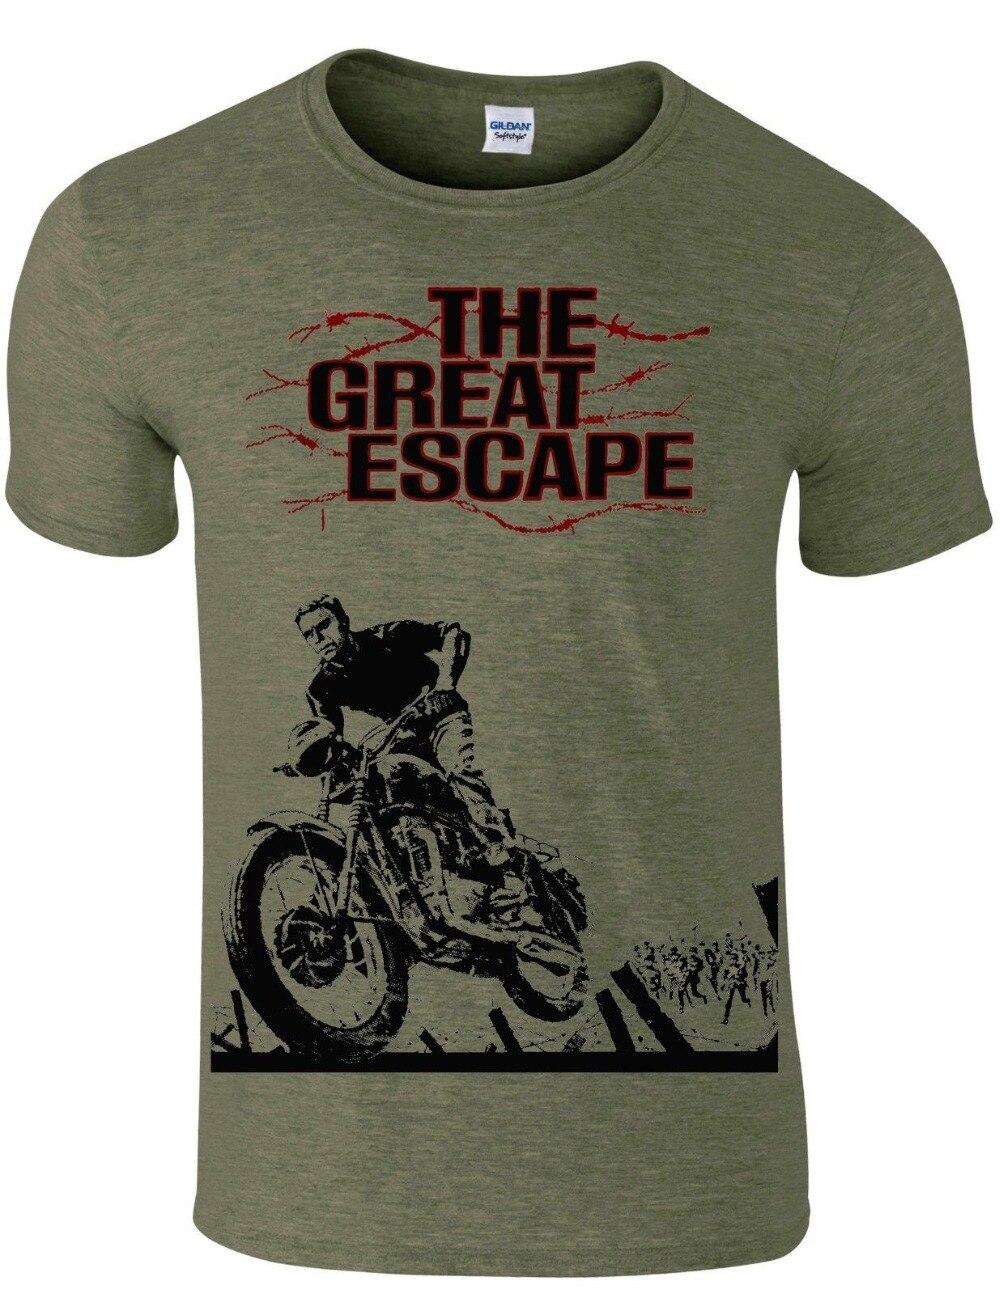 Steve Mcqueen Die Great Escape Biker Cafe Rennen Motorrad Film Männer T Shirt Marke Männer Mode Sommer Auflistung Mode